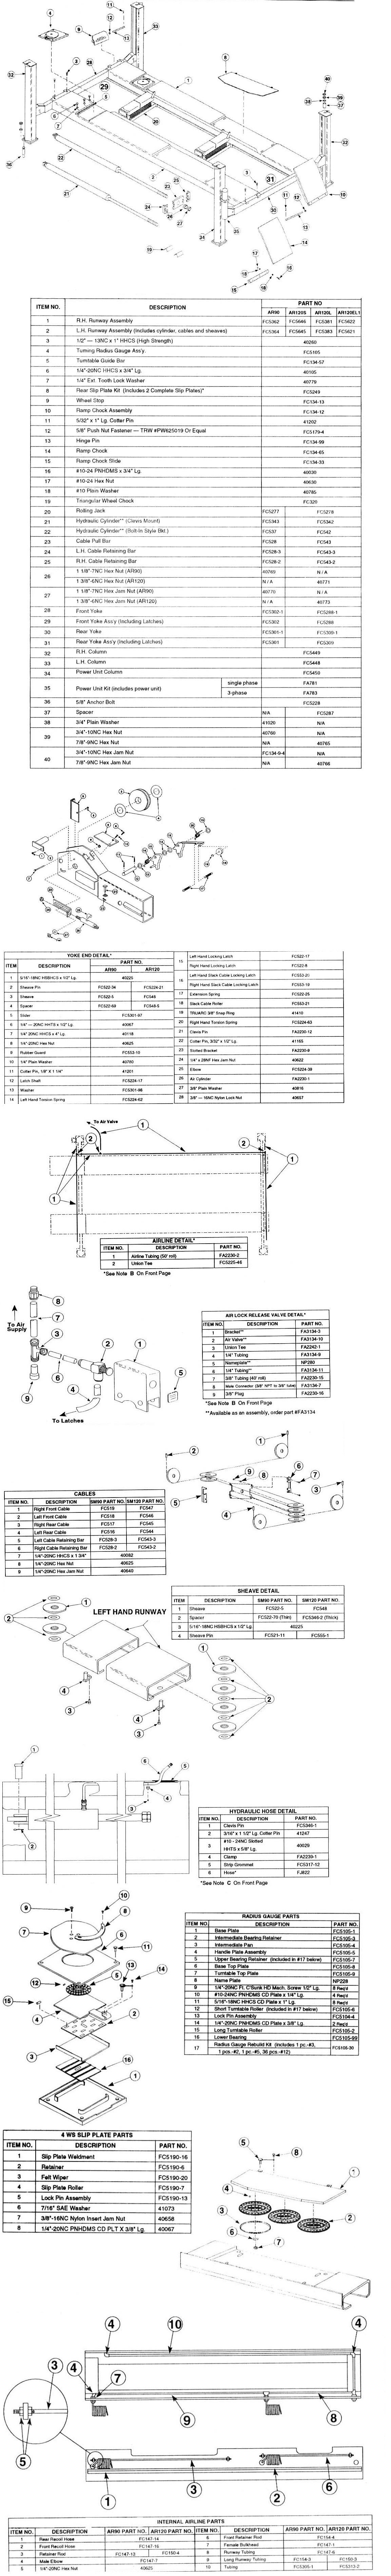 rotary ar90 parts diagram rotary dial phone parts rotary phone parts diagram #32